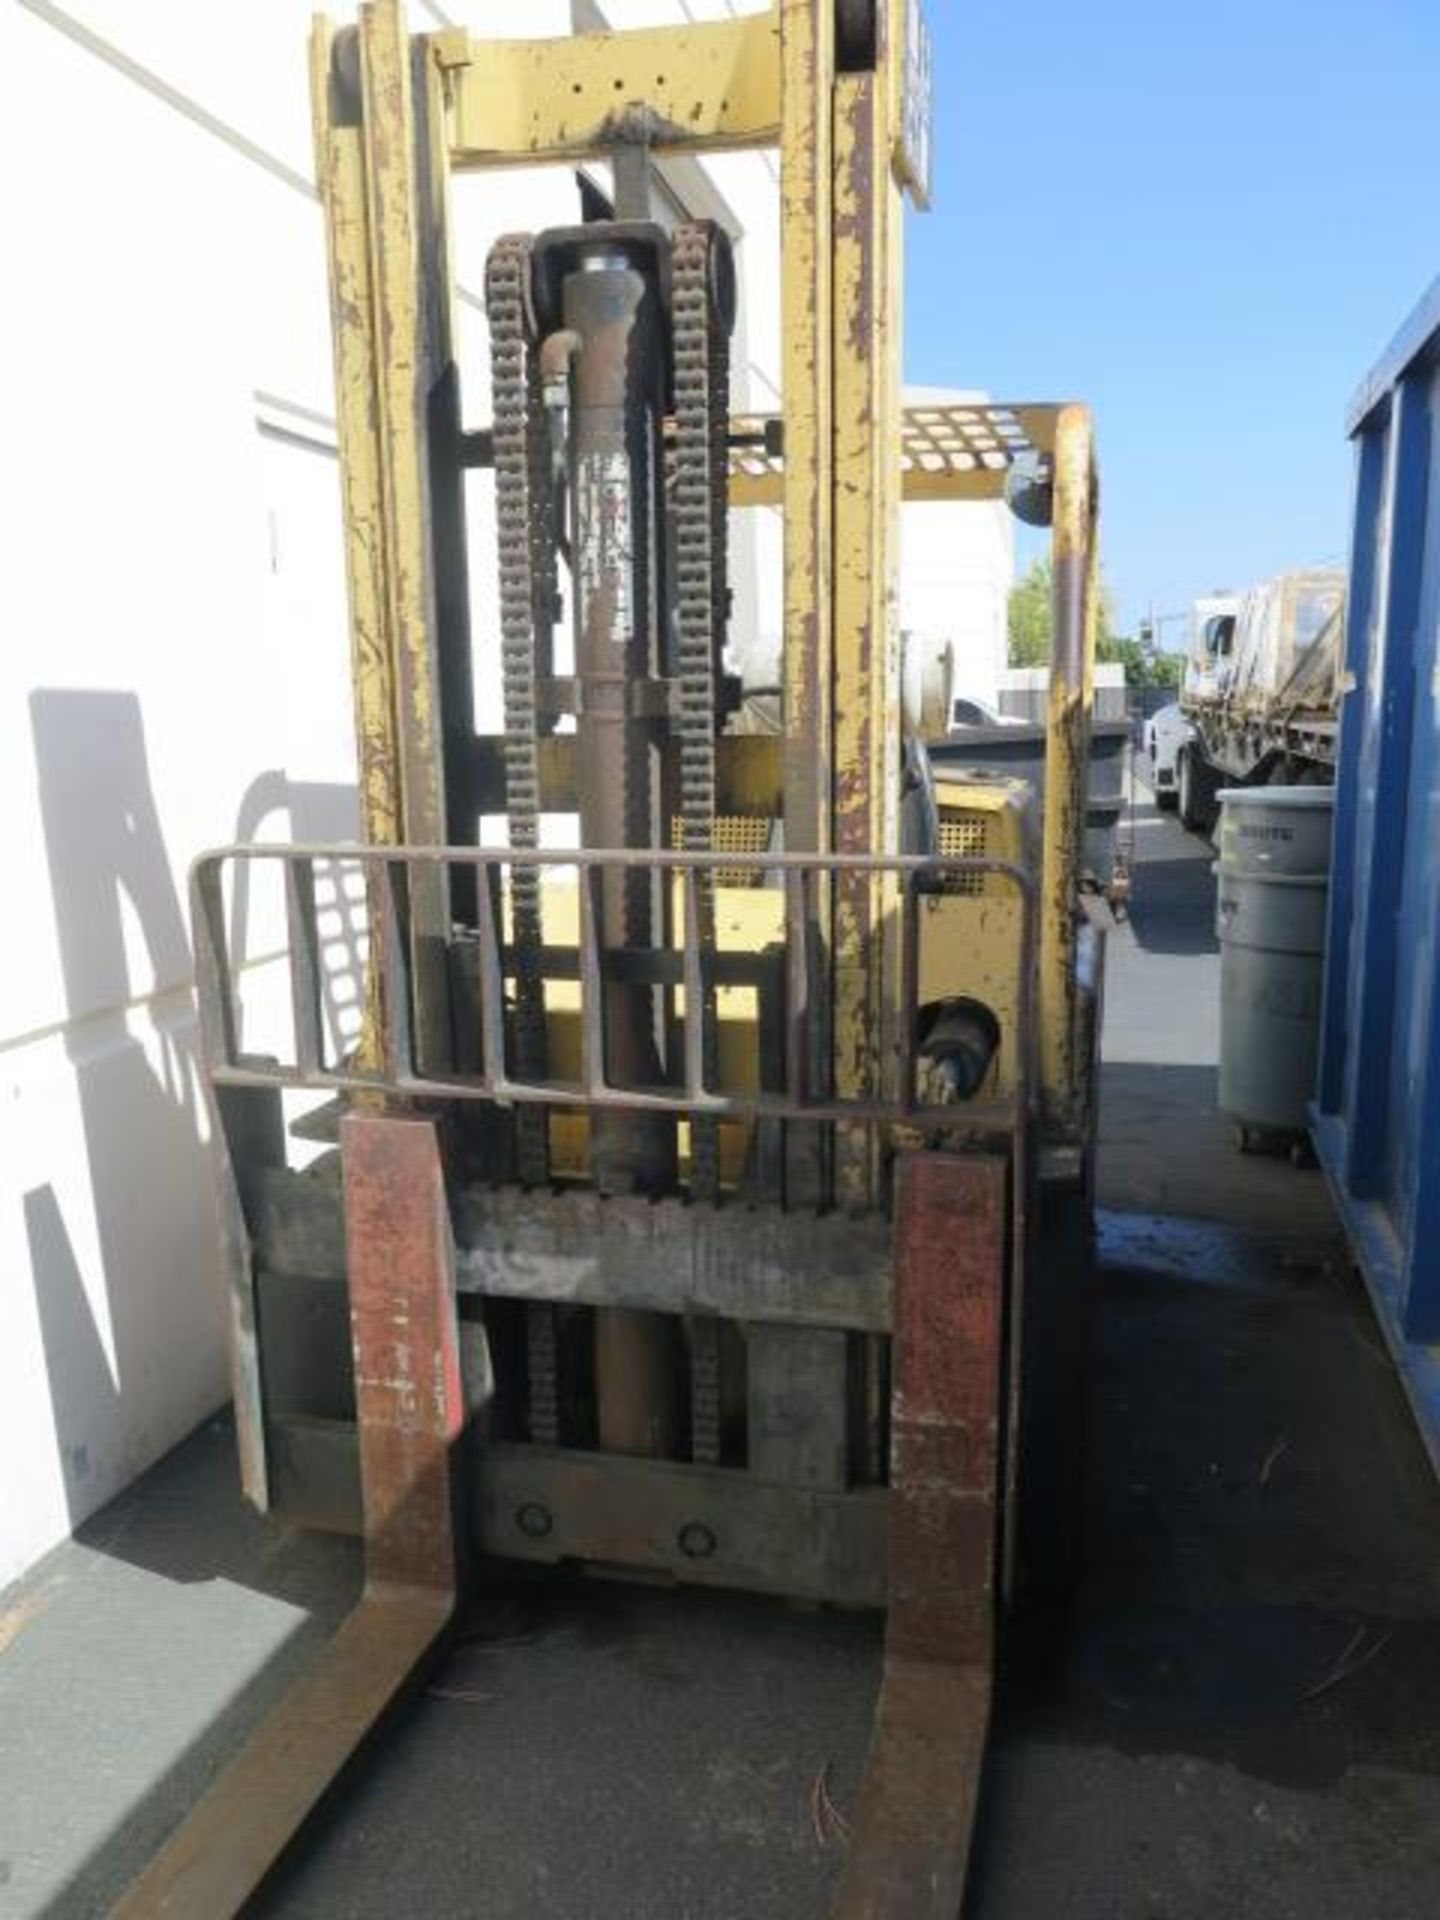 "Hyster S125A 12,500 Lb Cap LPG Forklift s/n A024DC4389A w/ 2-Stage Mast, 129"" Lift Height, 2-Speed T - Image 10 of 14"